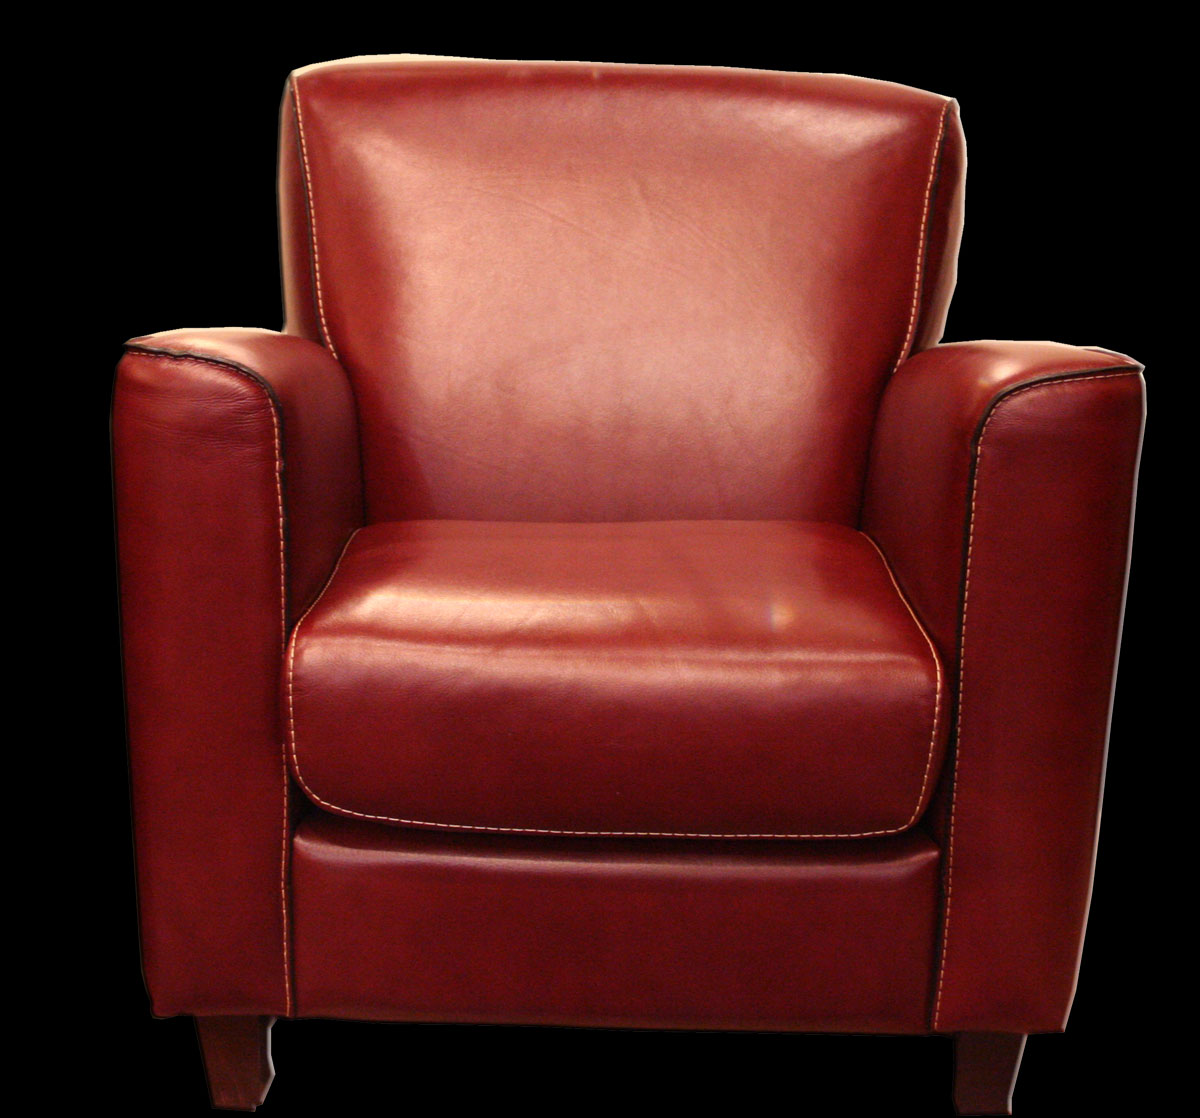 Fauteuil Maline En Cuir Rouge LongField - Fauteuil cuir rouge